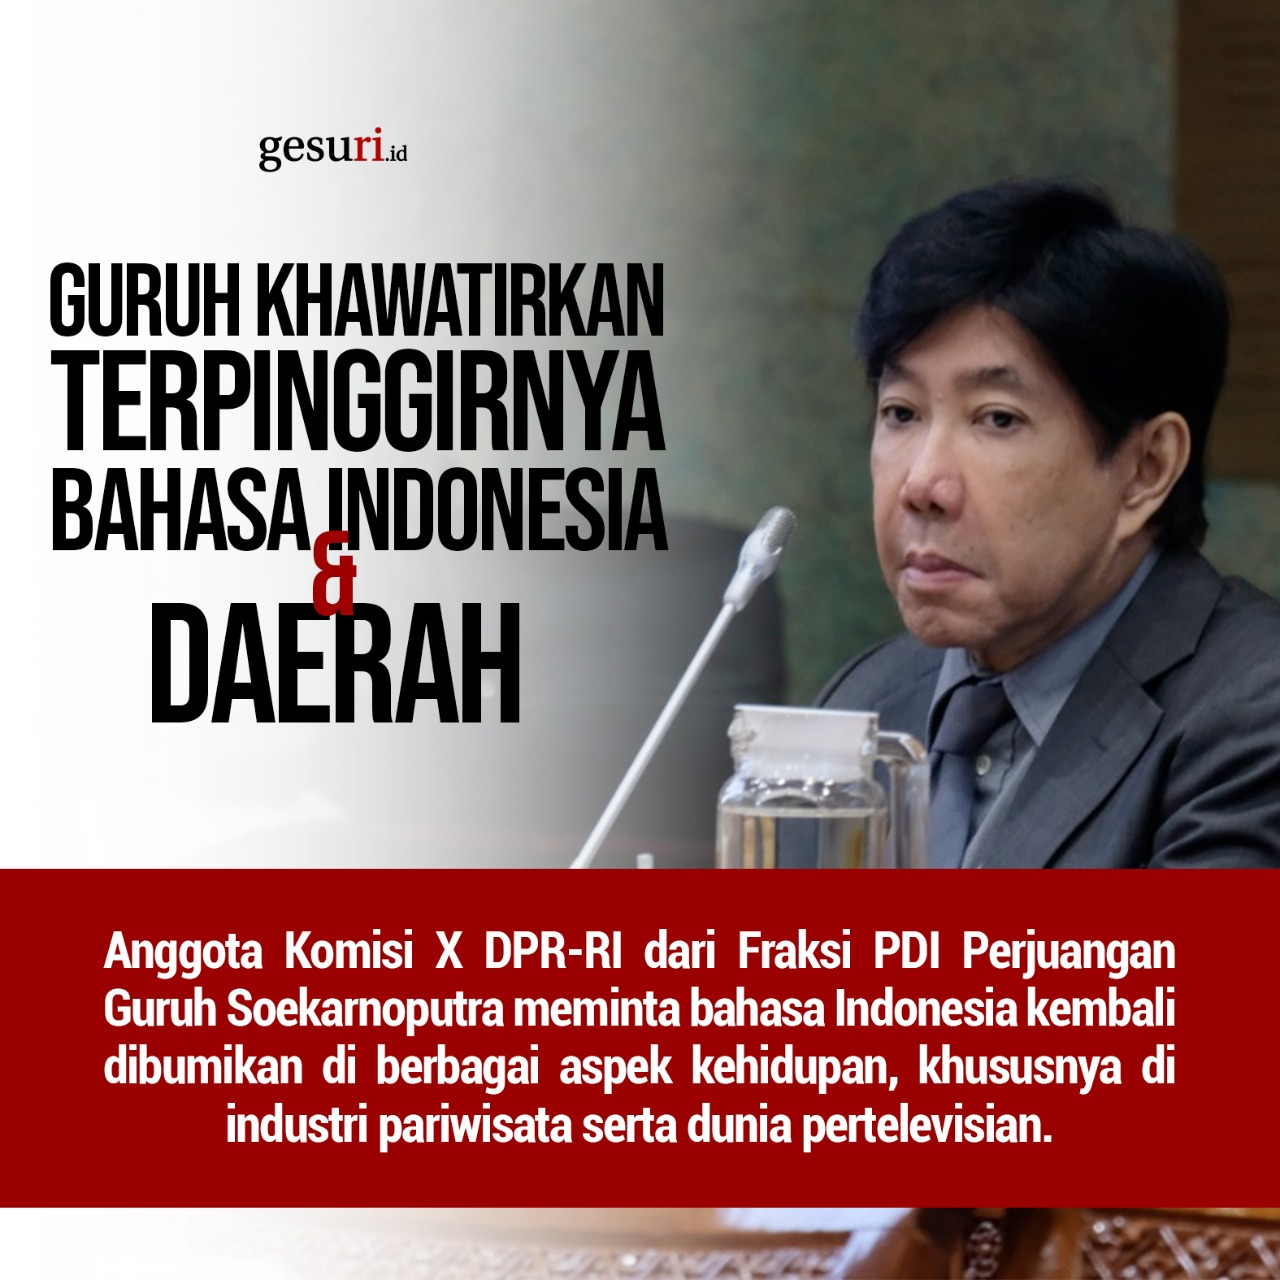 Guruh Khawatirkan Terpinggirnya Bahasa Indonesia dan Daerah